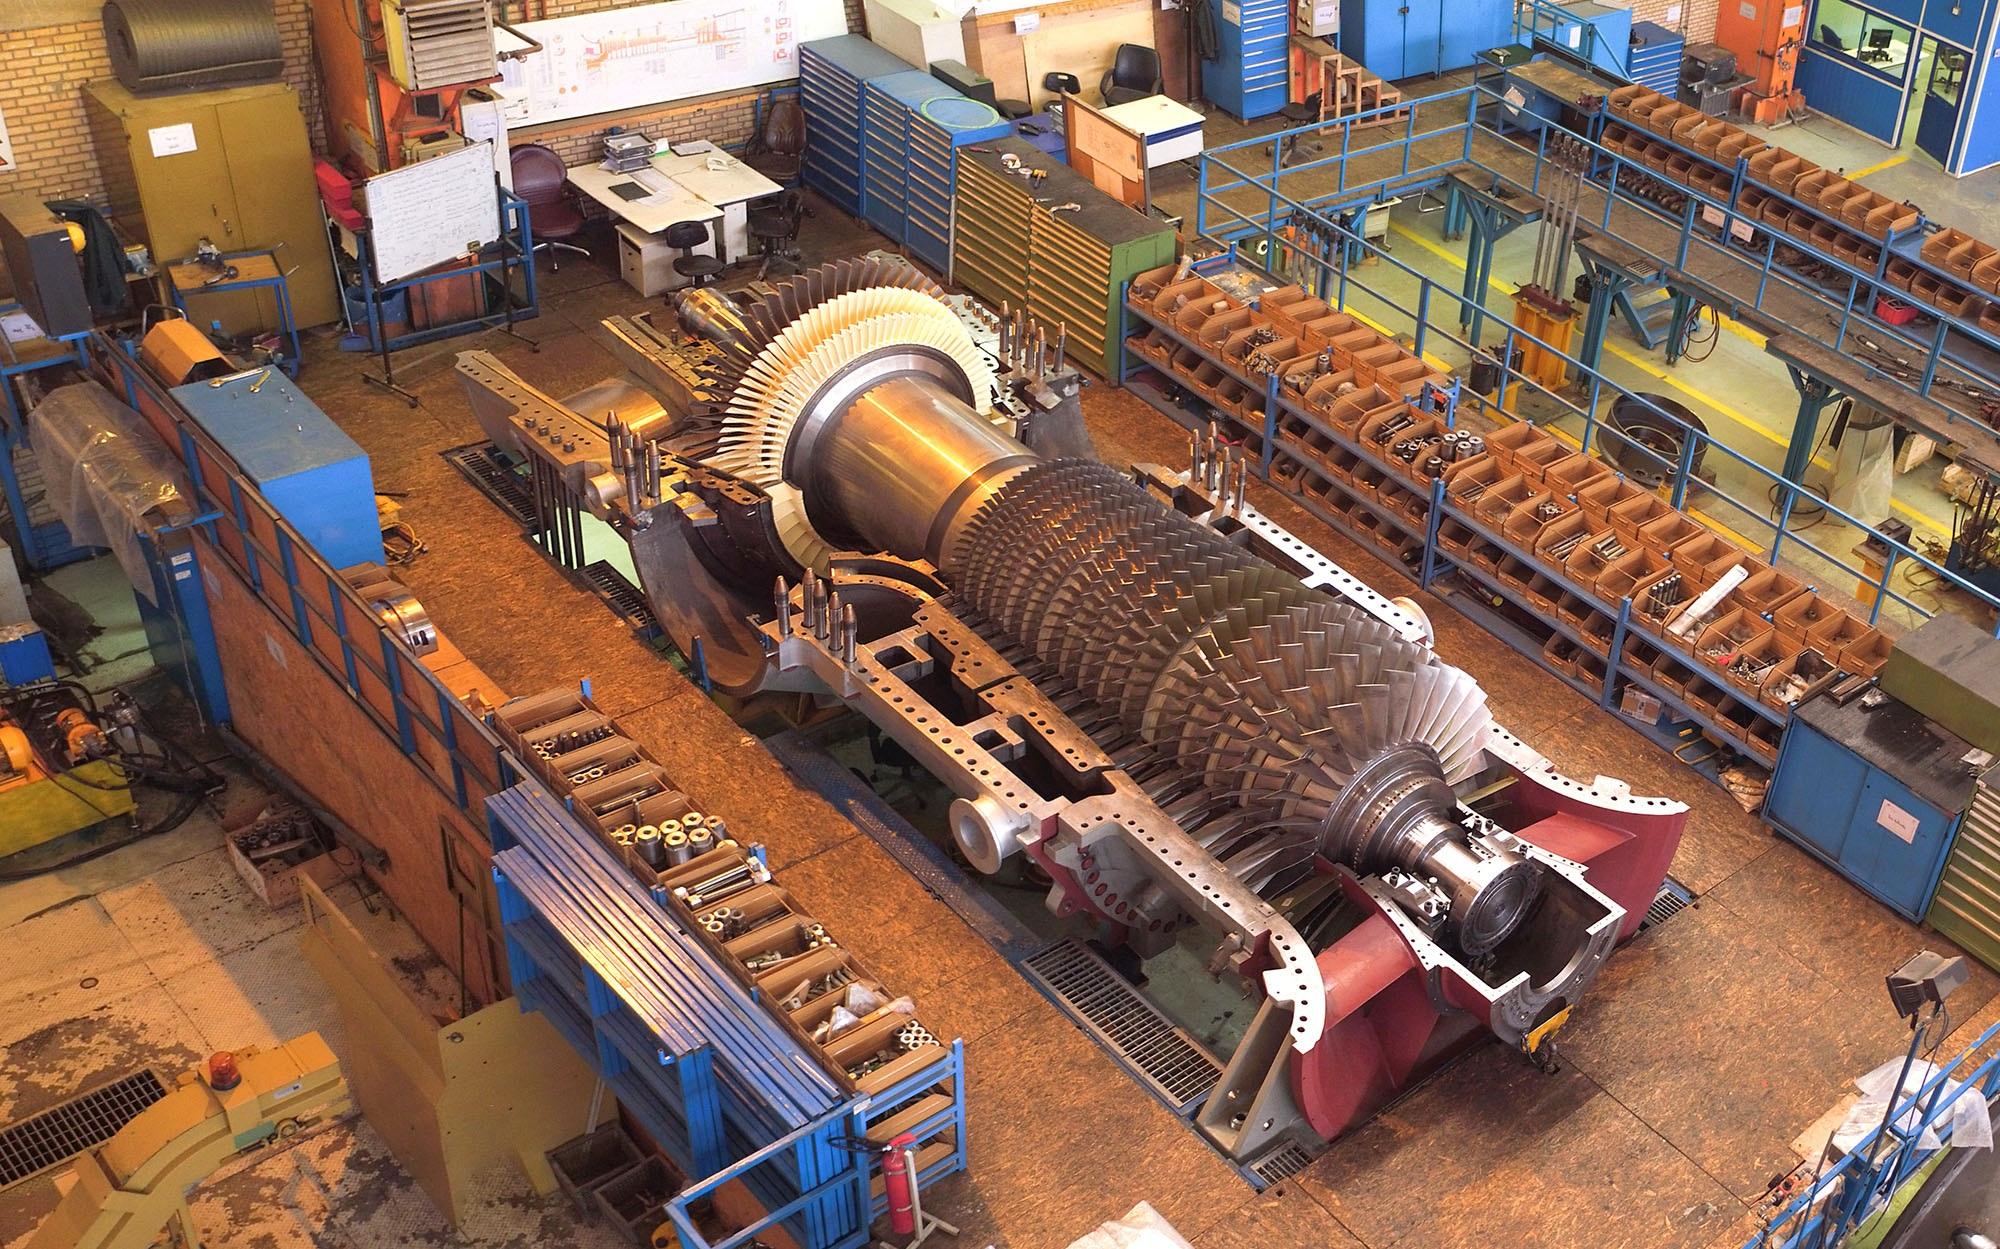 Domestic Turbine Manufacturing Booming